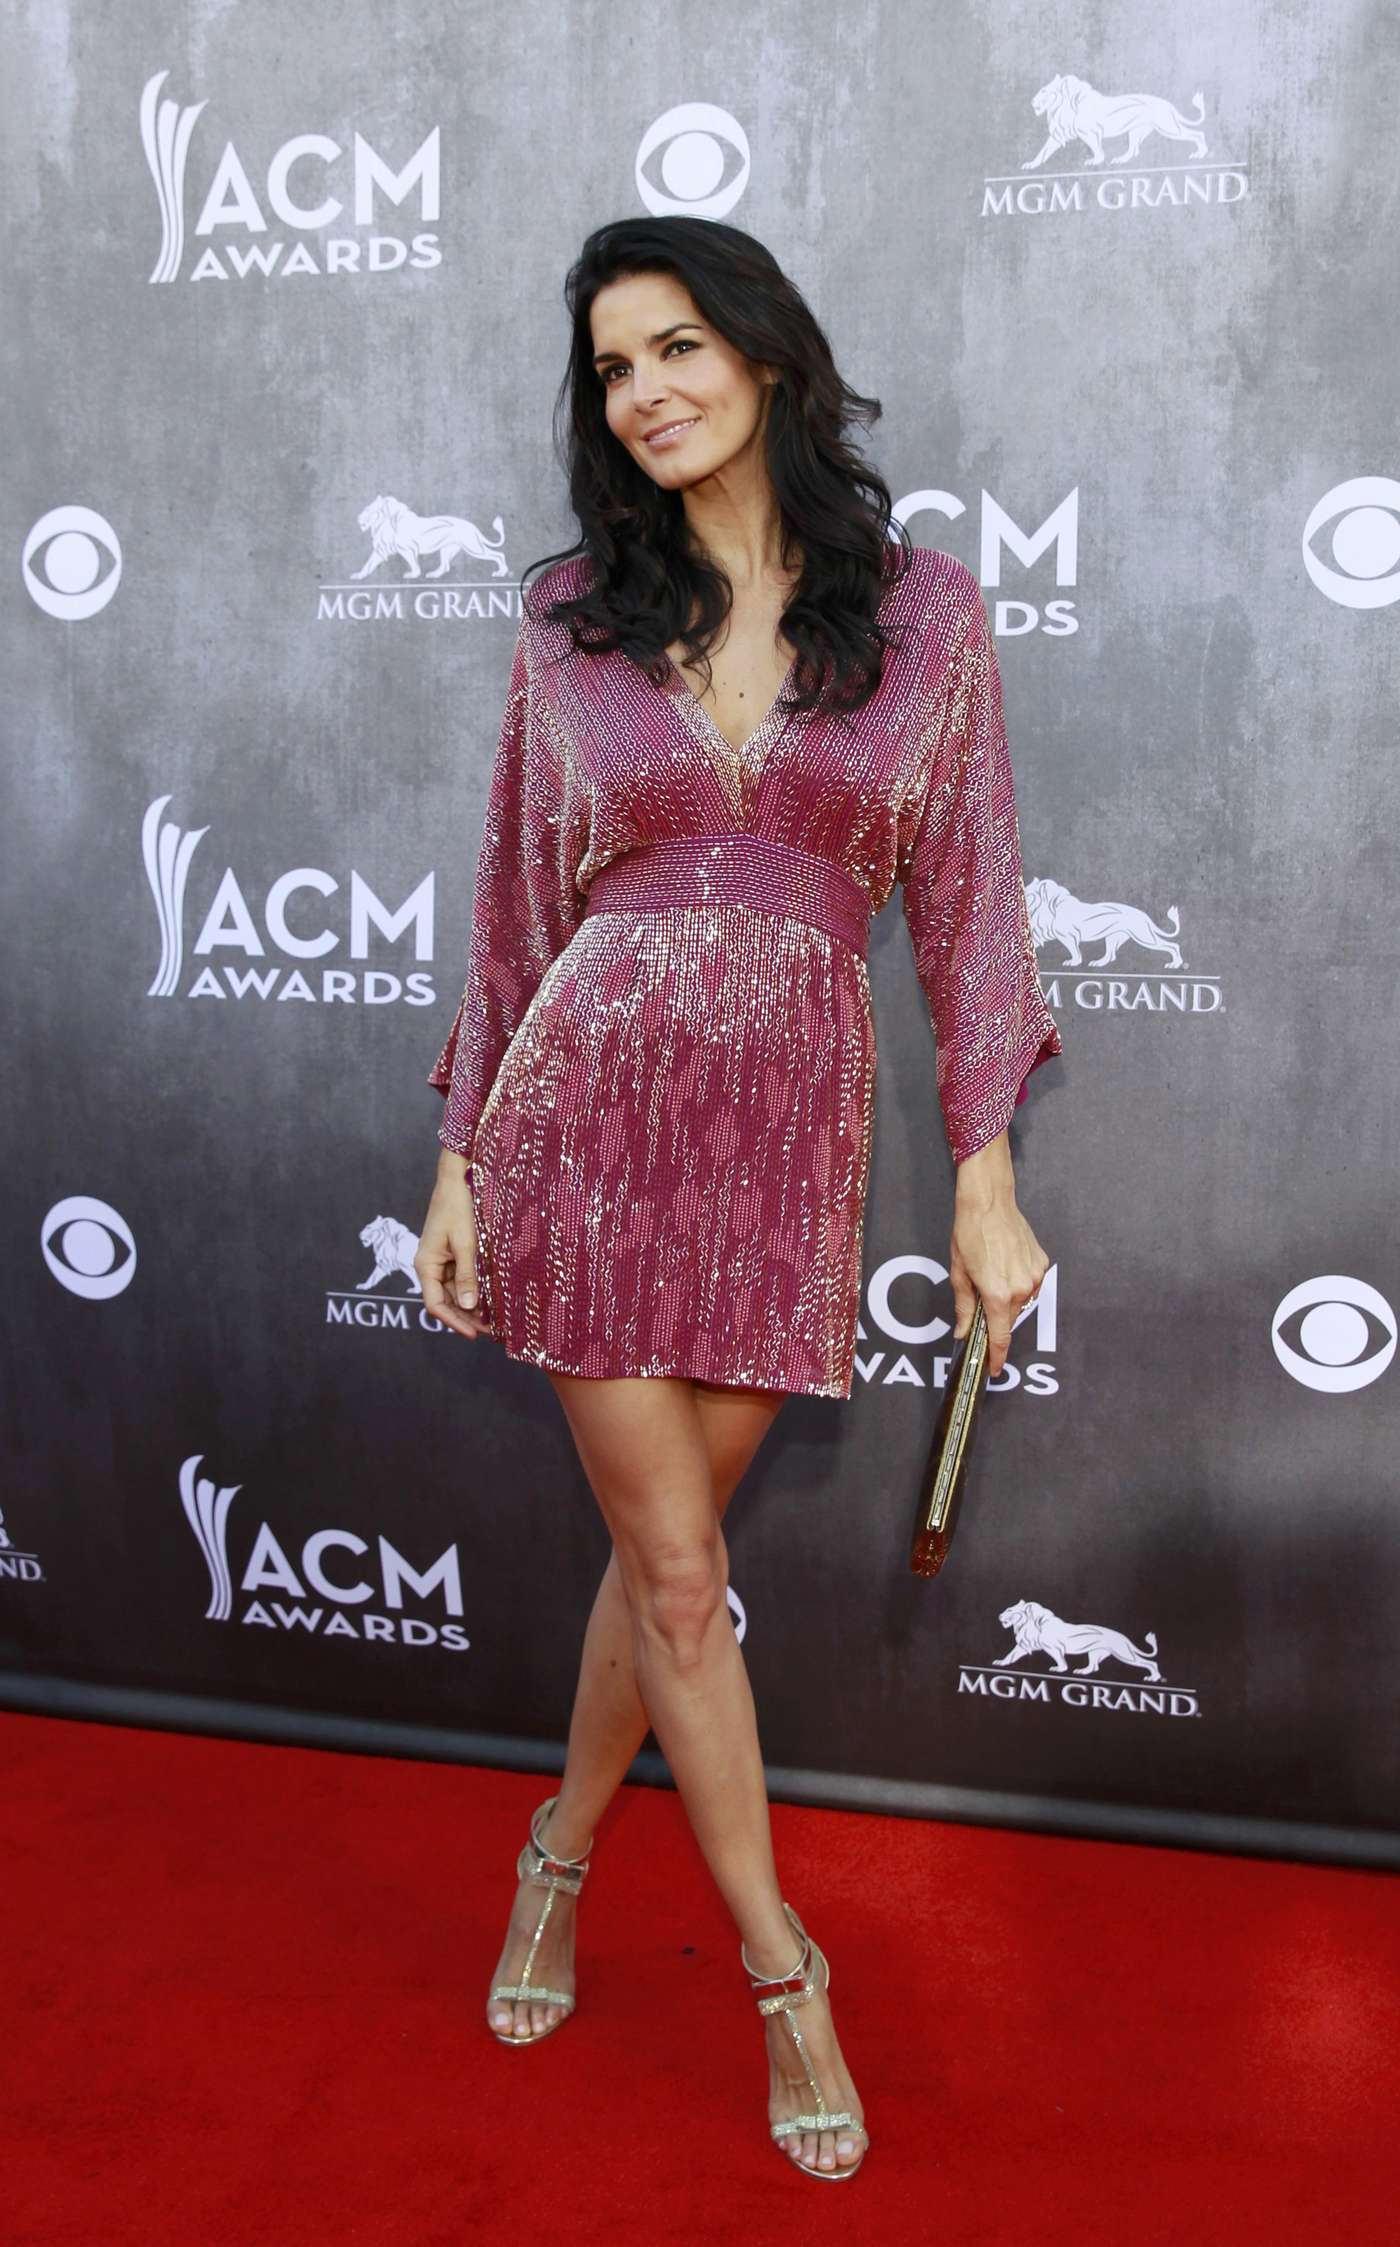 Angie Harmon 2014 Academy Of Country Music Awards 02 Gotceleb